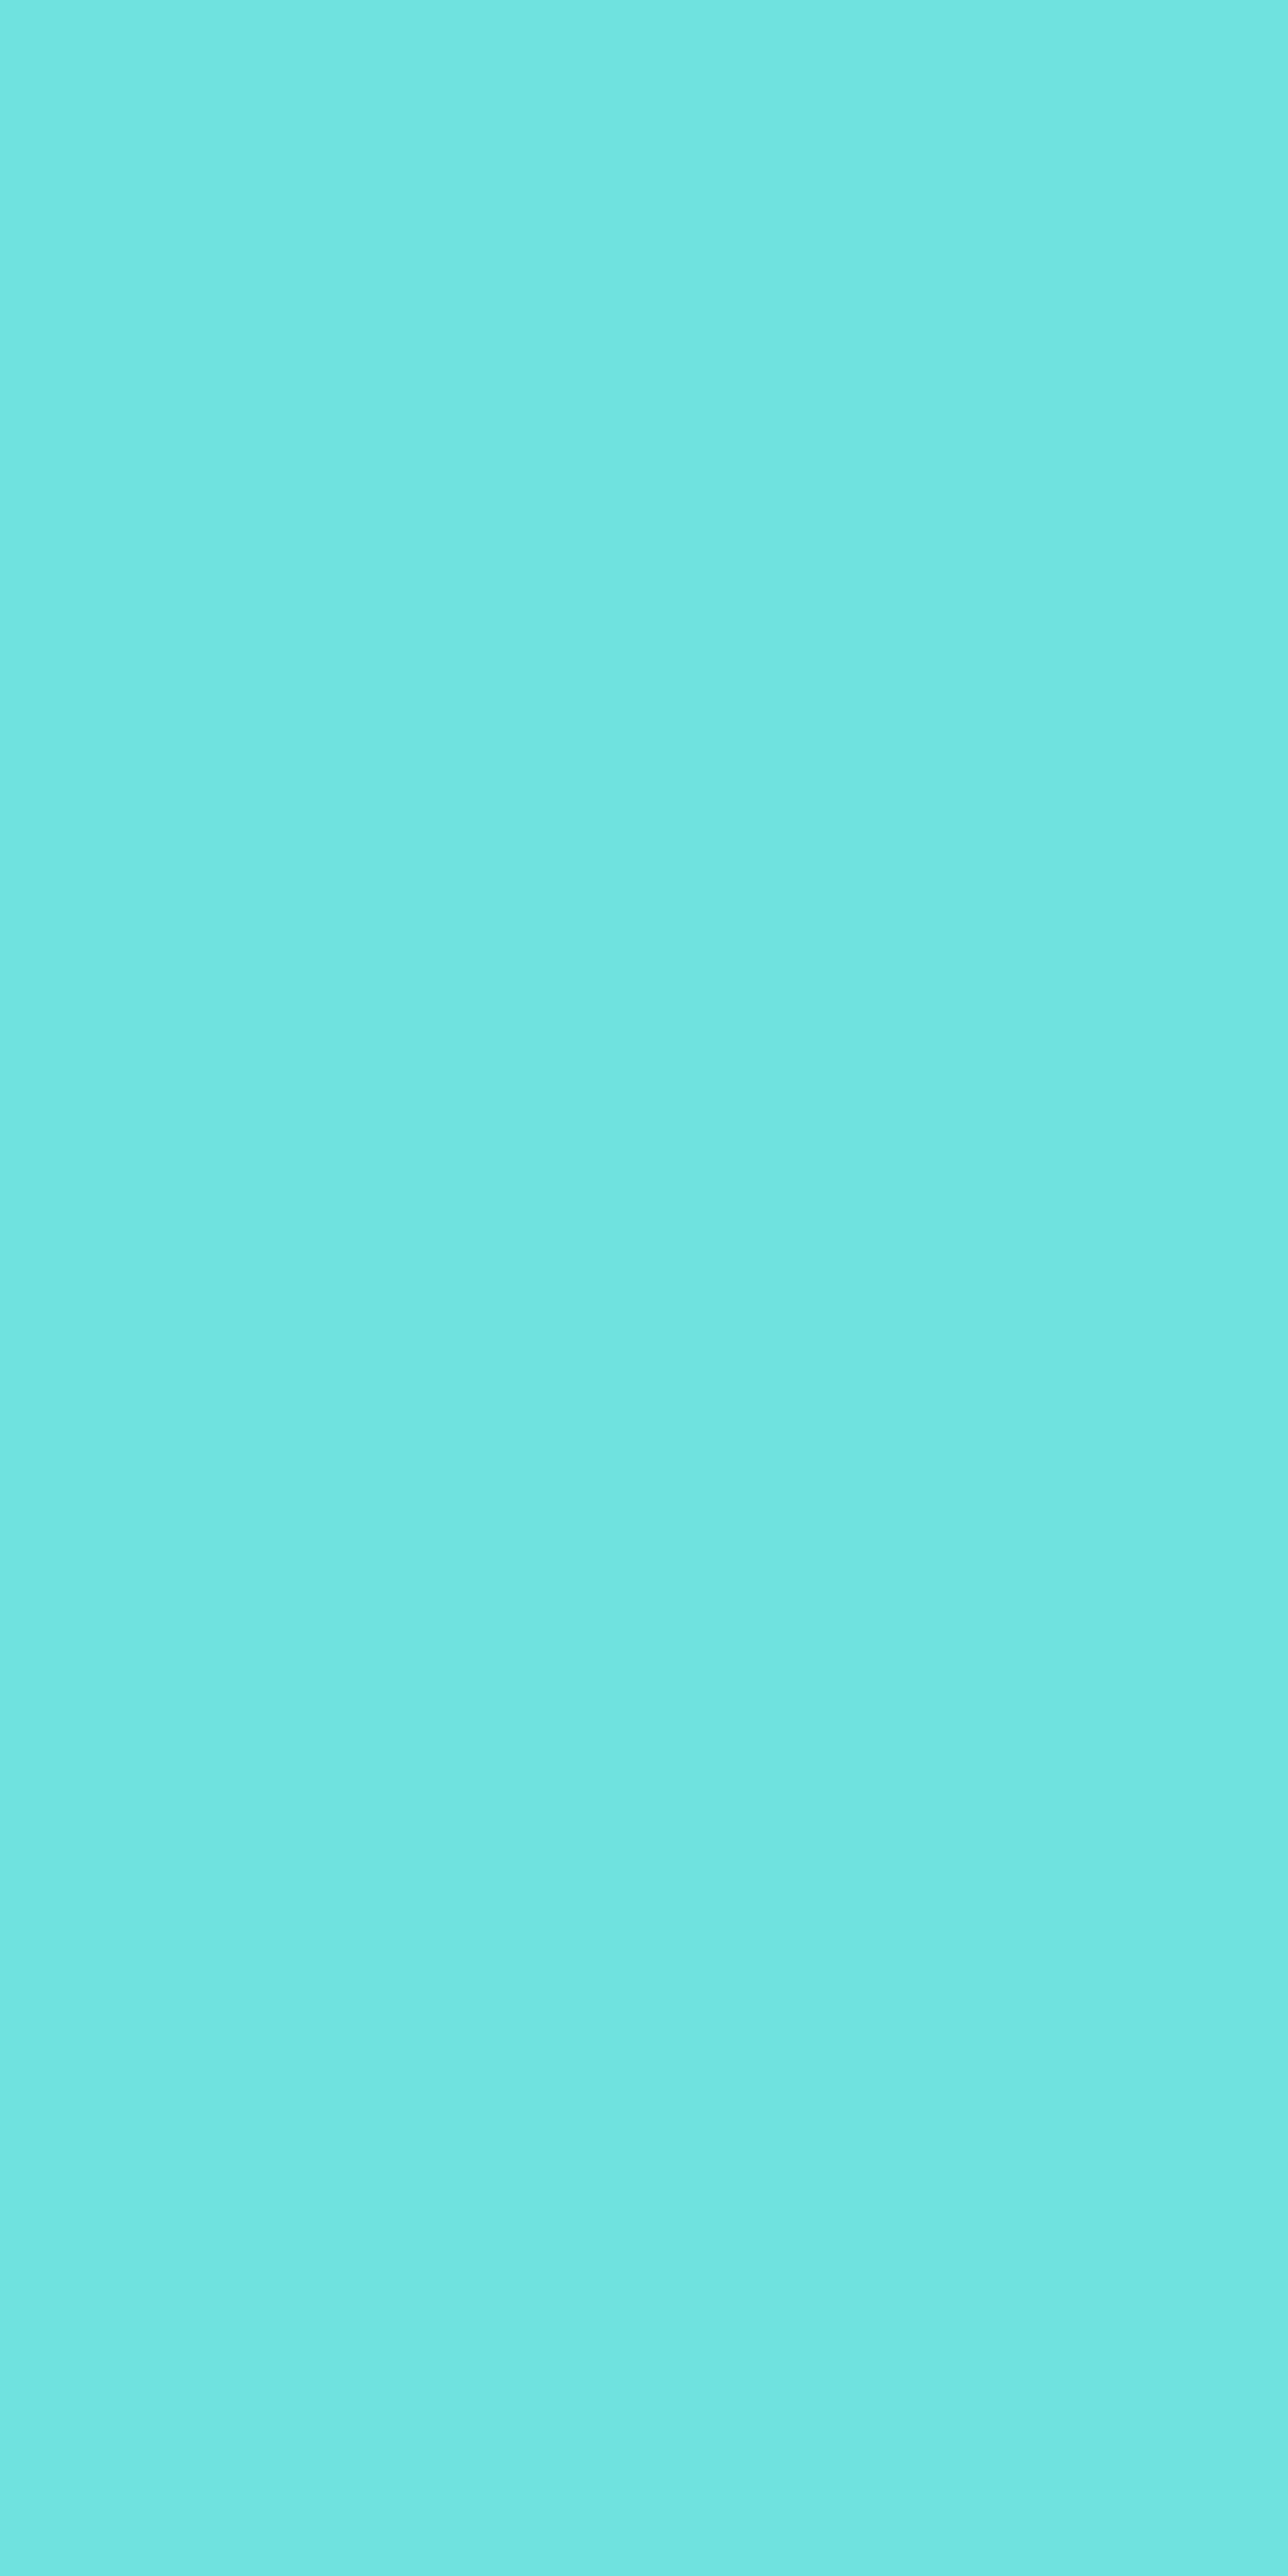 BSH 2441 DM - Turquoise matte high pressure laminate